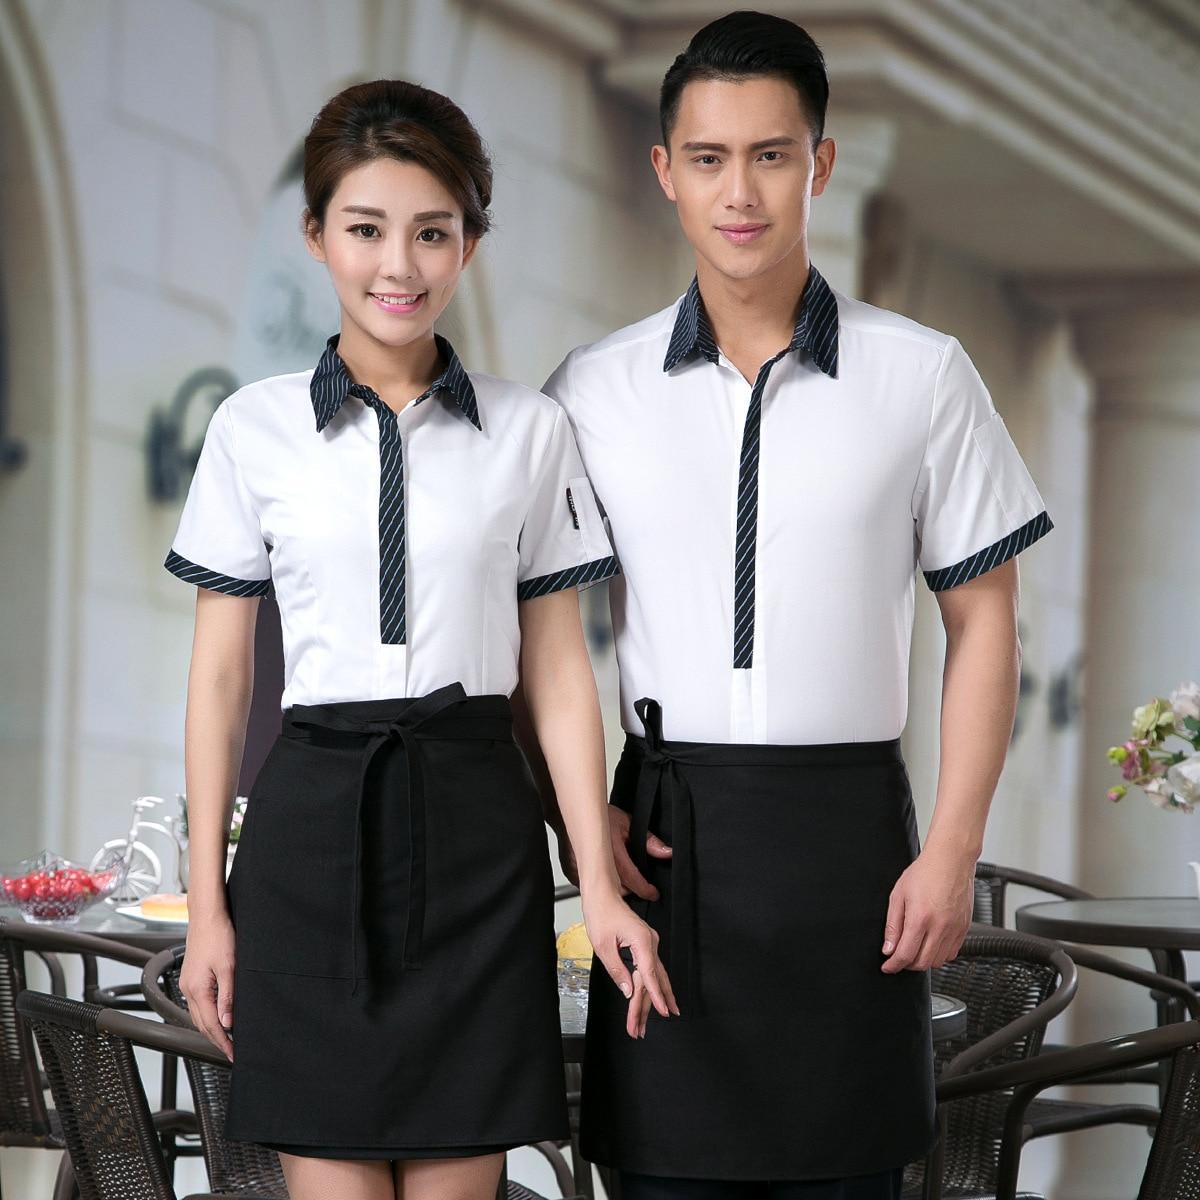 Hotel Restaurant Female Waitress Work Clothes Shirt Summer Cafe Hot Pot Shop Uniform Short-sleeved Barbecue Waiter Jacket H2334